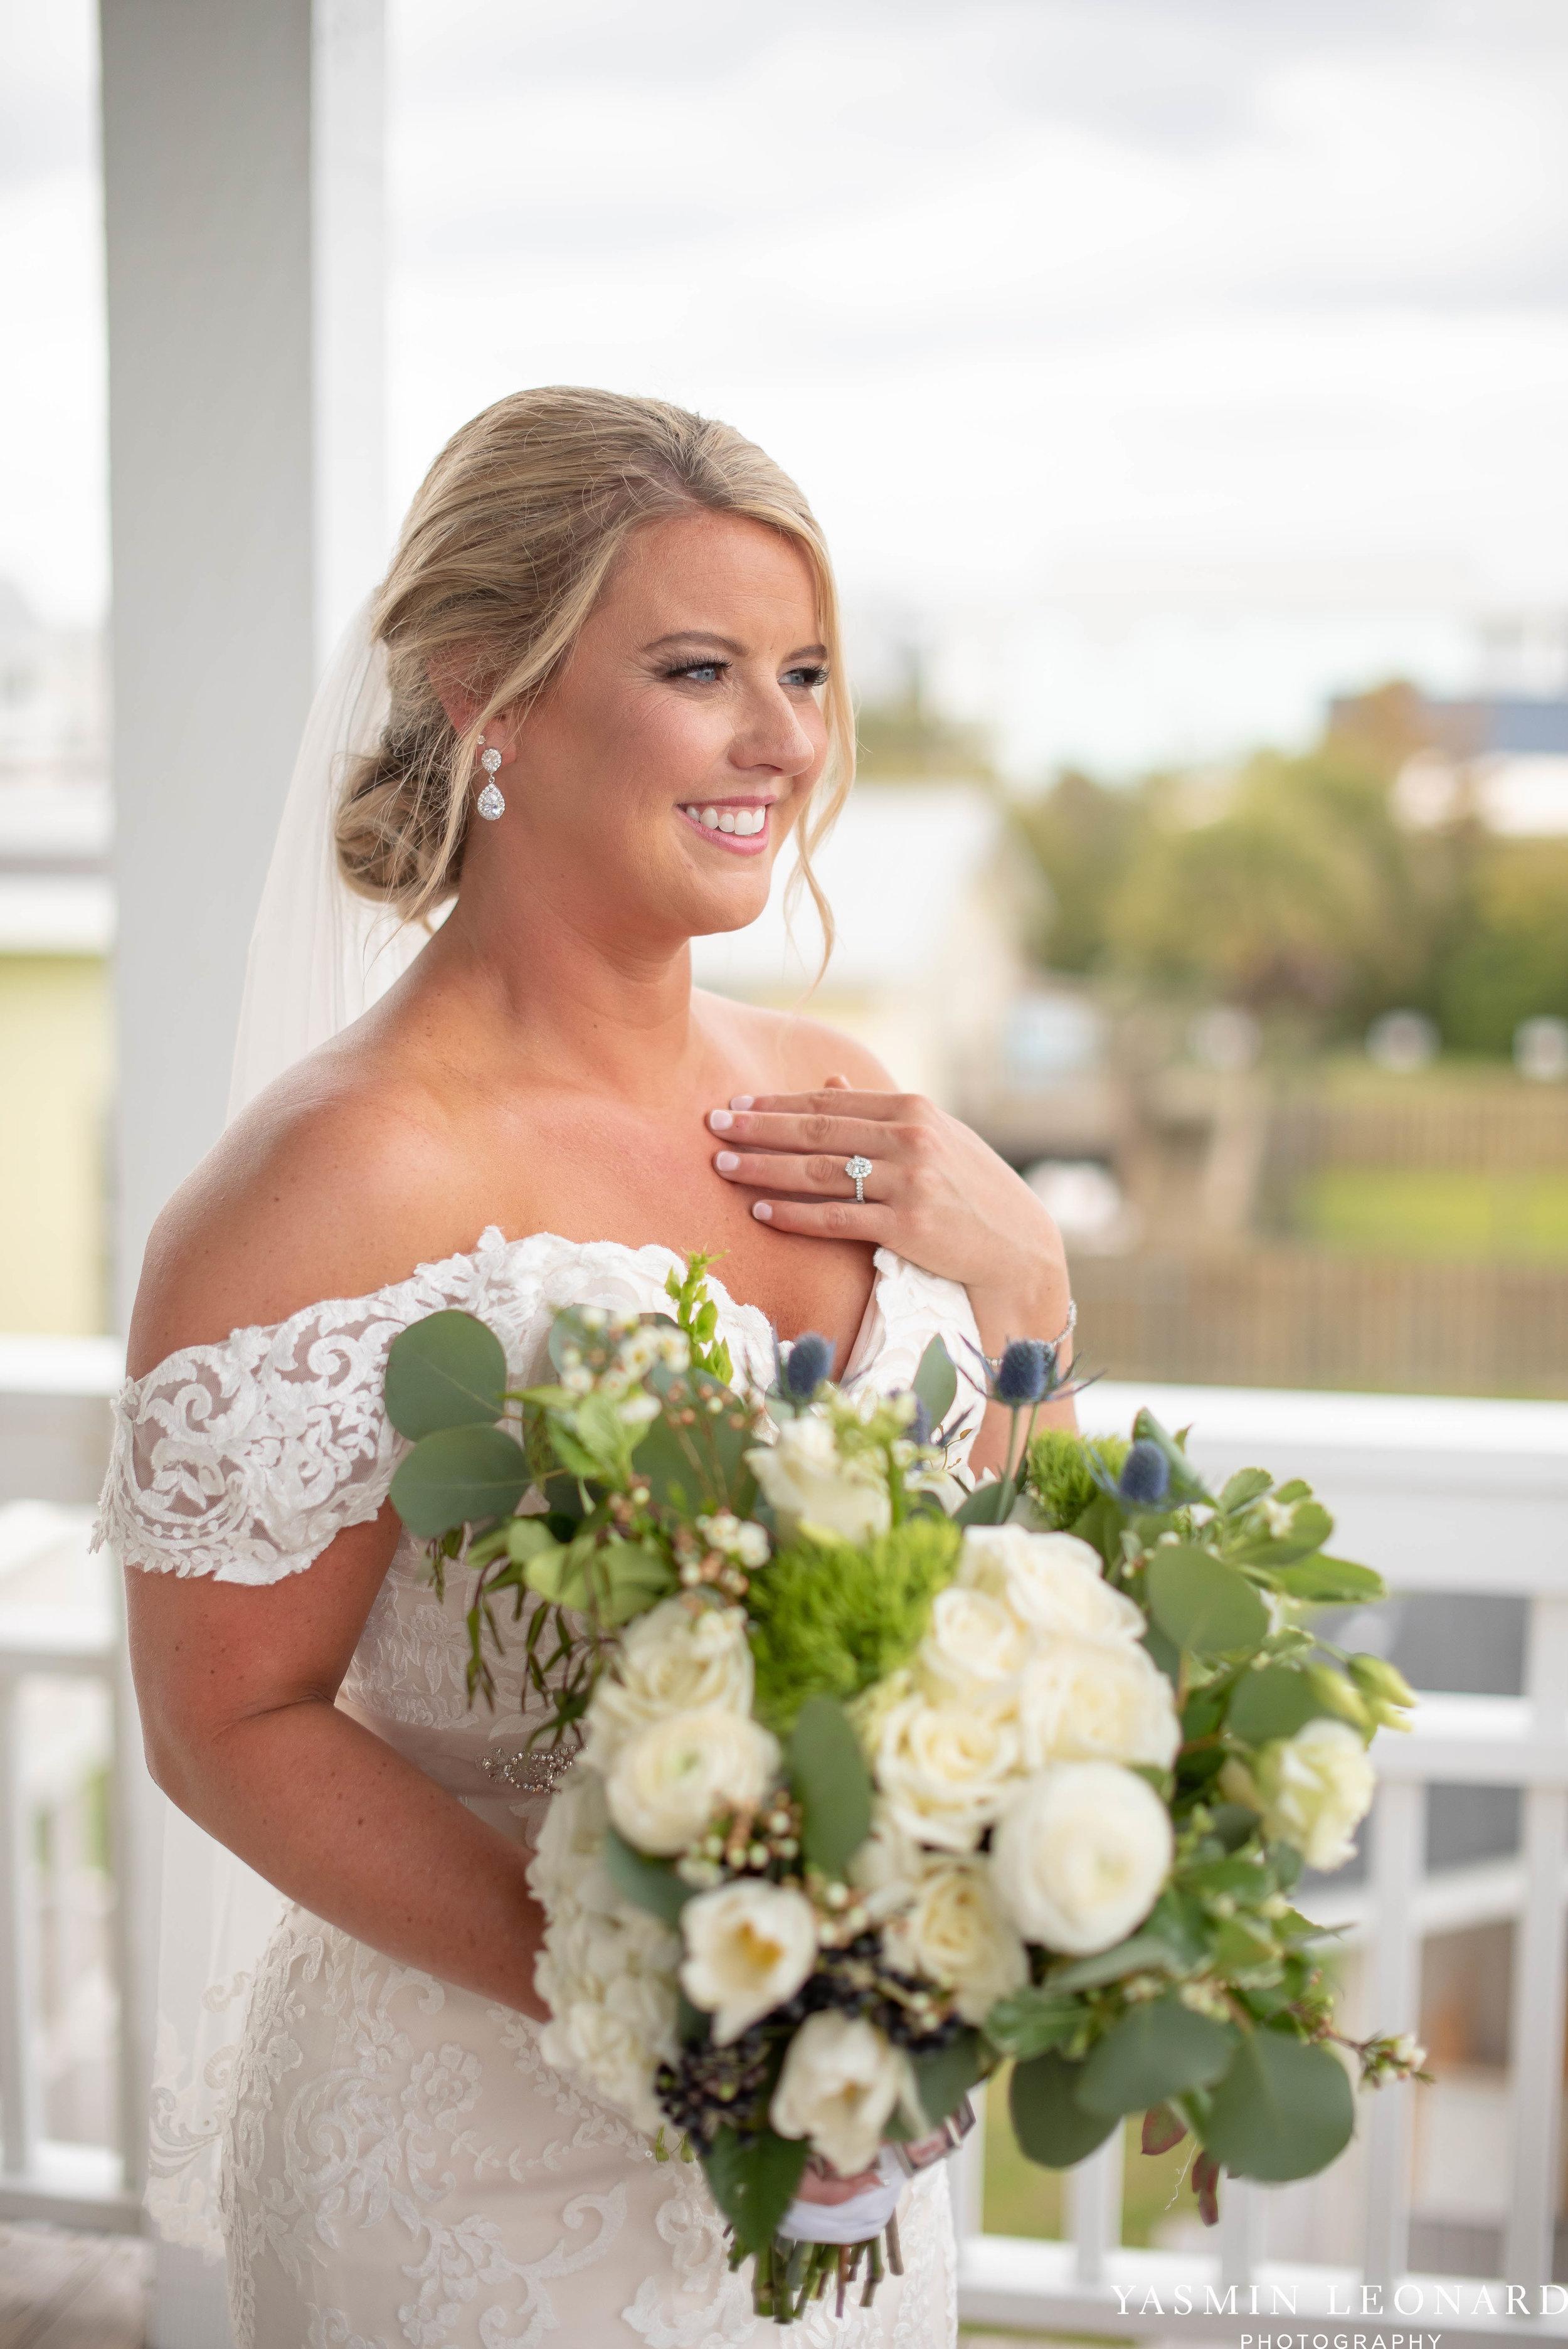 Carolina Beach Wedding - Fort Fisher Wedding - NC Acquarium - Beach Wedding - NC Wedding - Beach Wedding Inspiration - Beach Bride-9.jpg